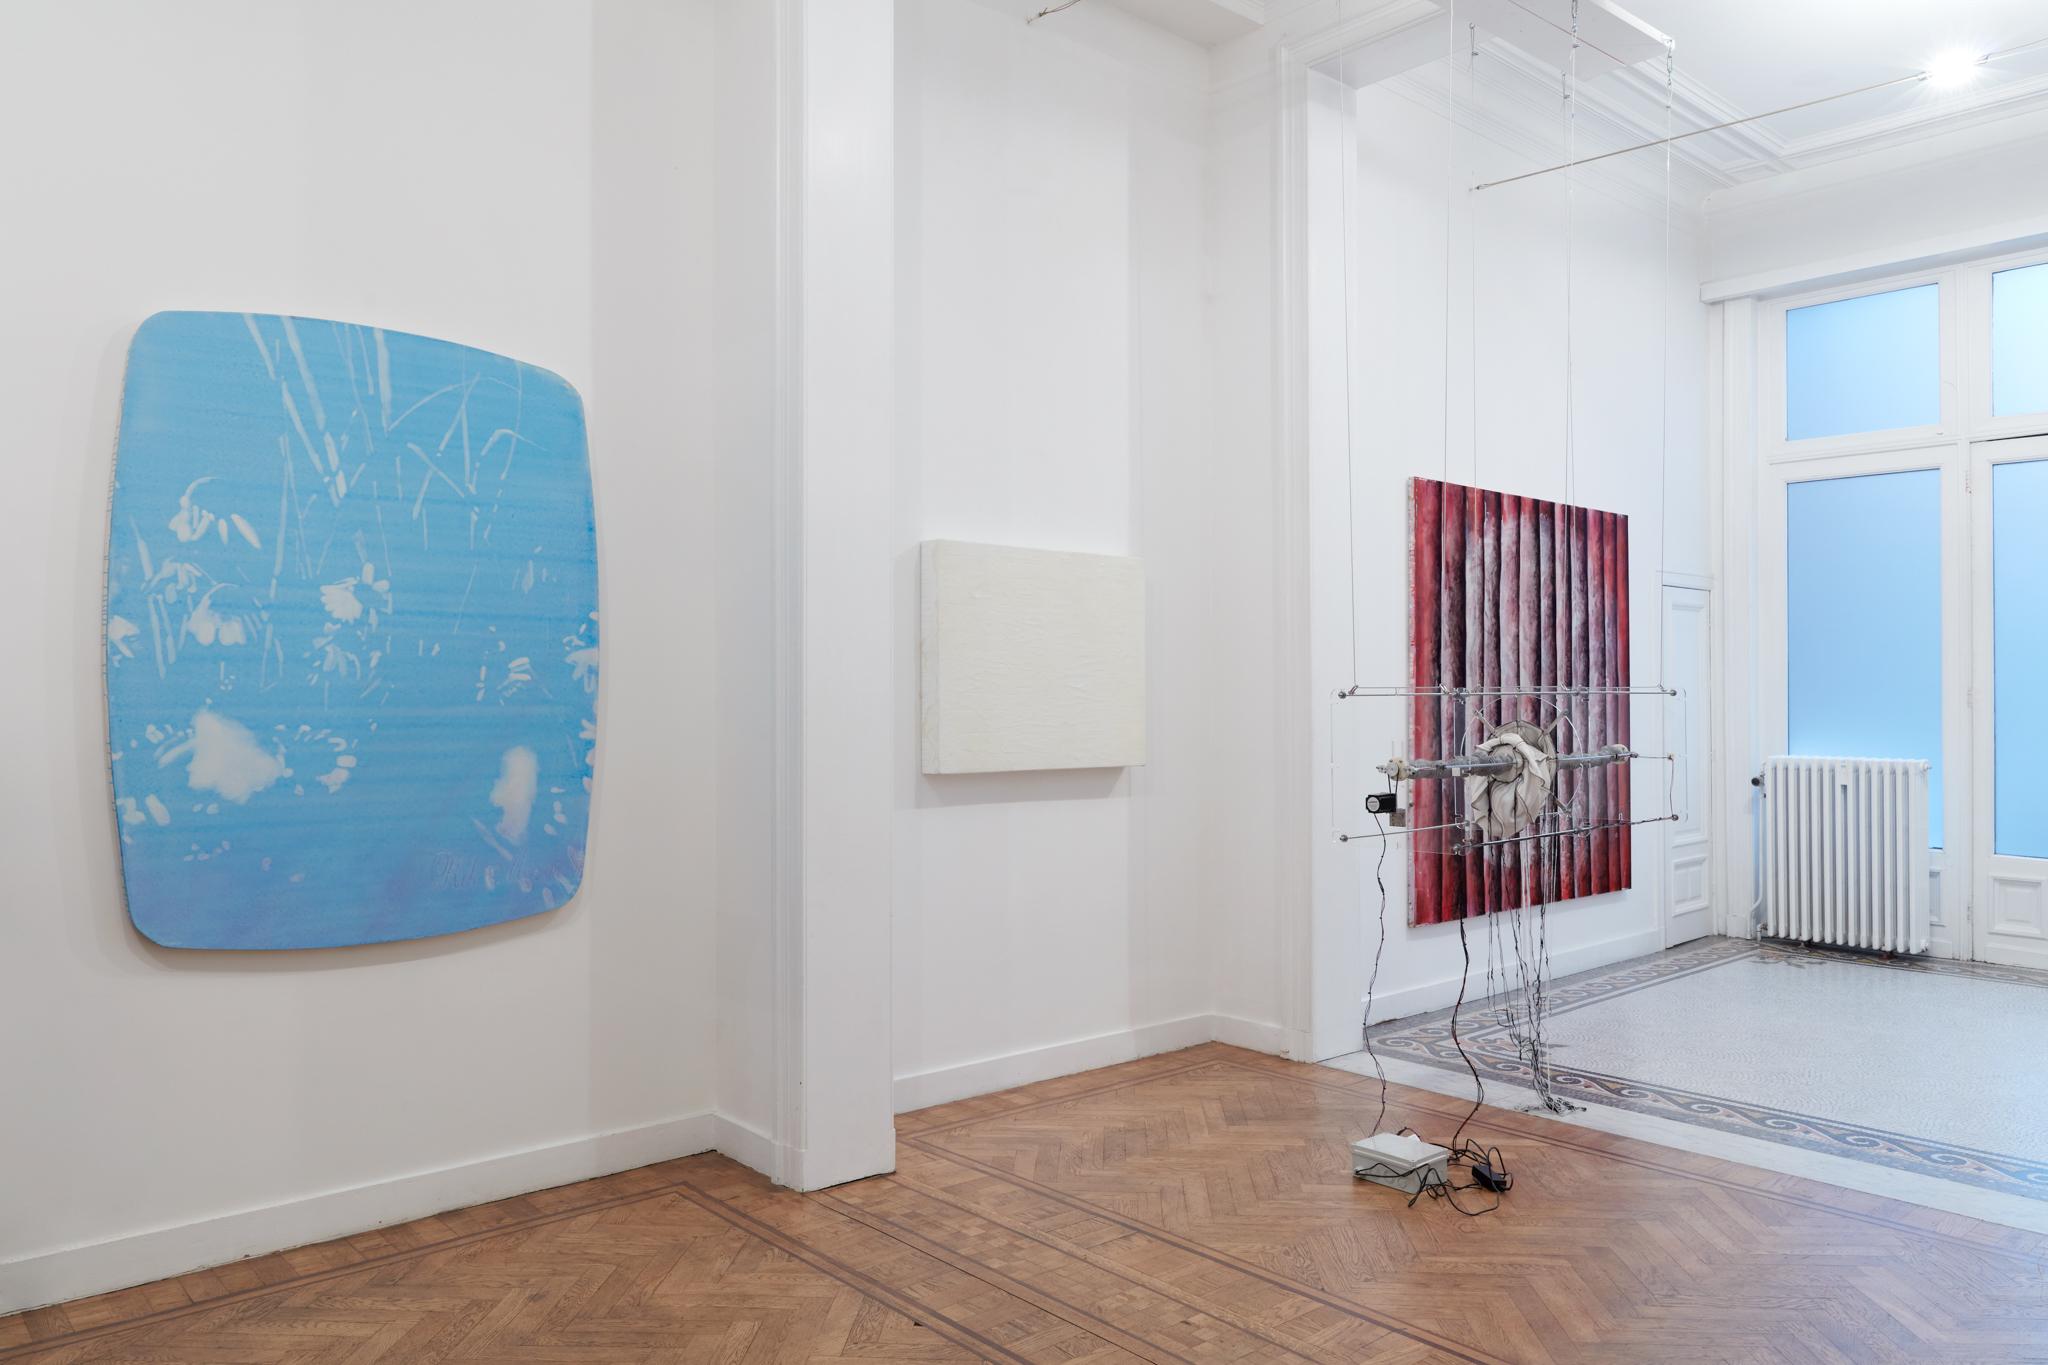 Rik Moens - Exhibition view